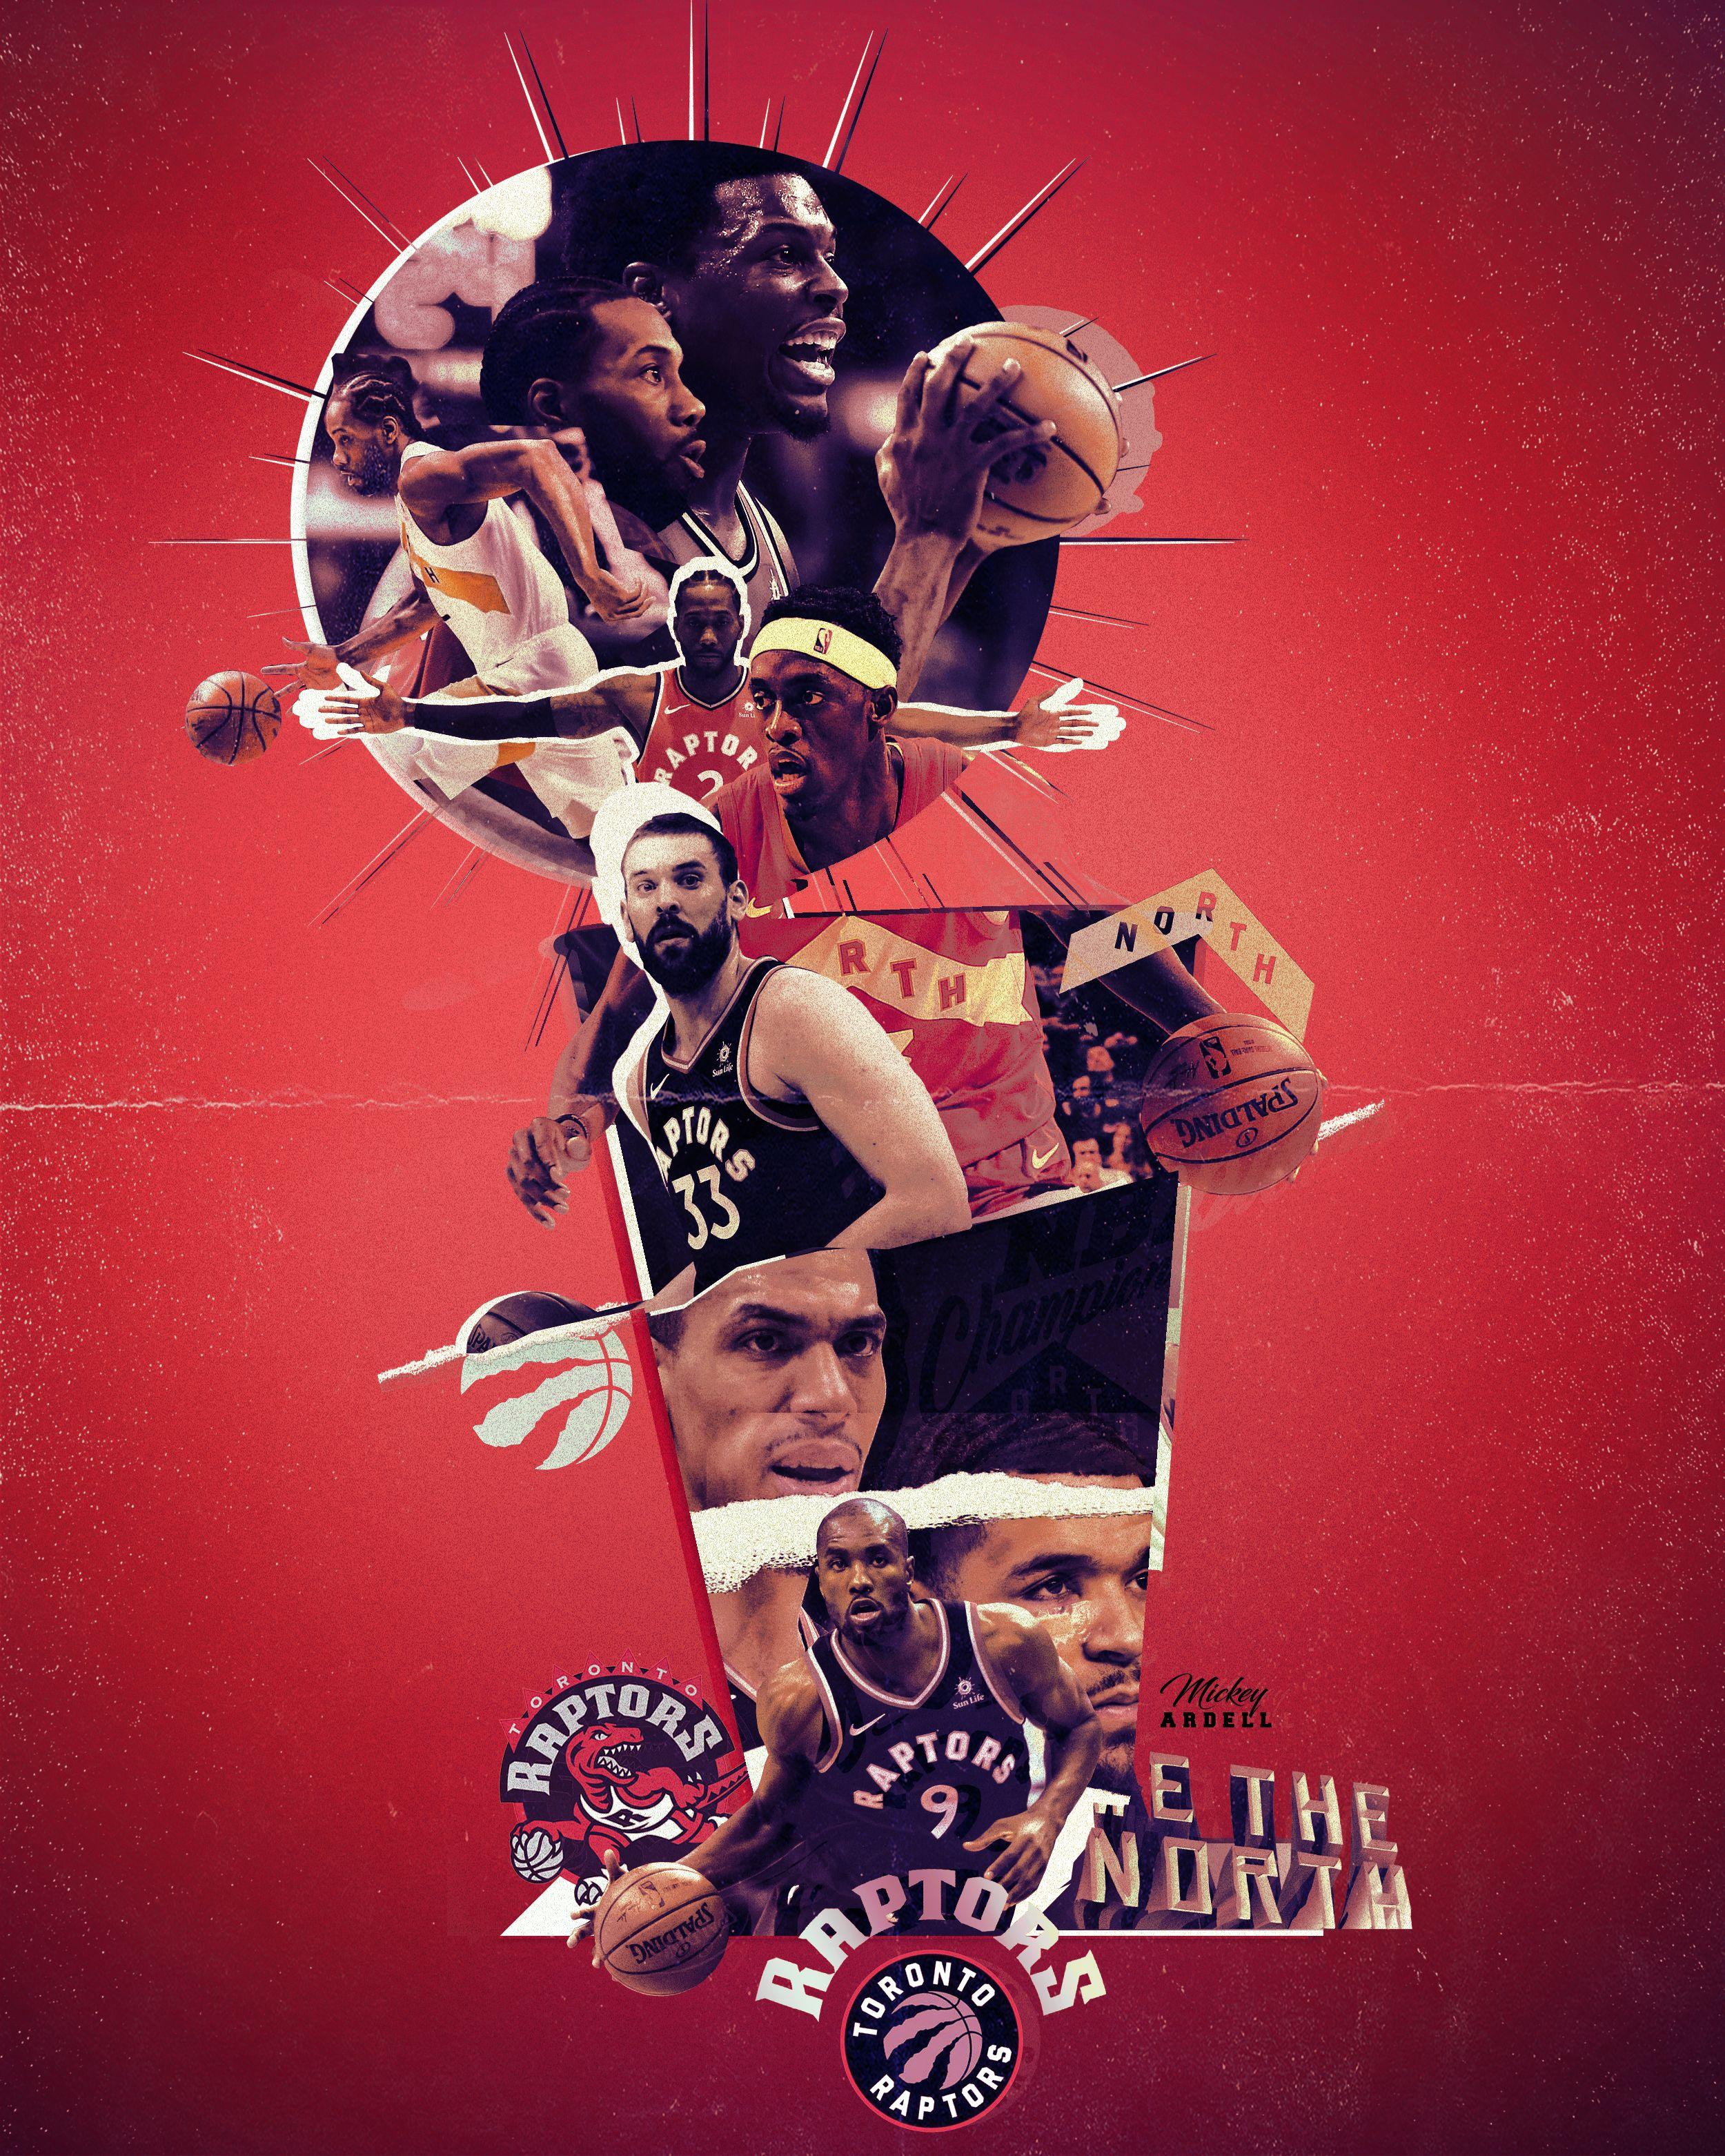 Toronto Raptors Nba Champions Raptors Basketball Toronto Raptors Basketball Nba Champions